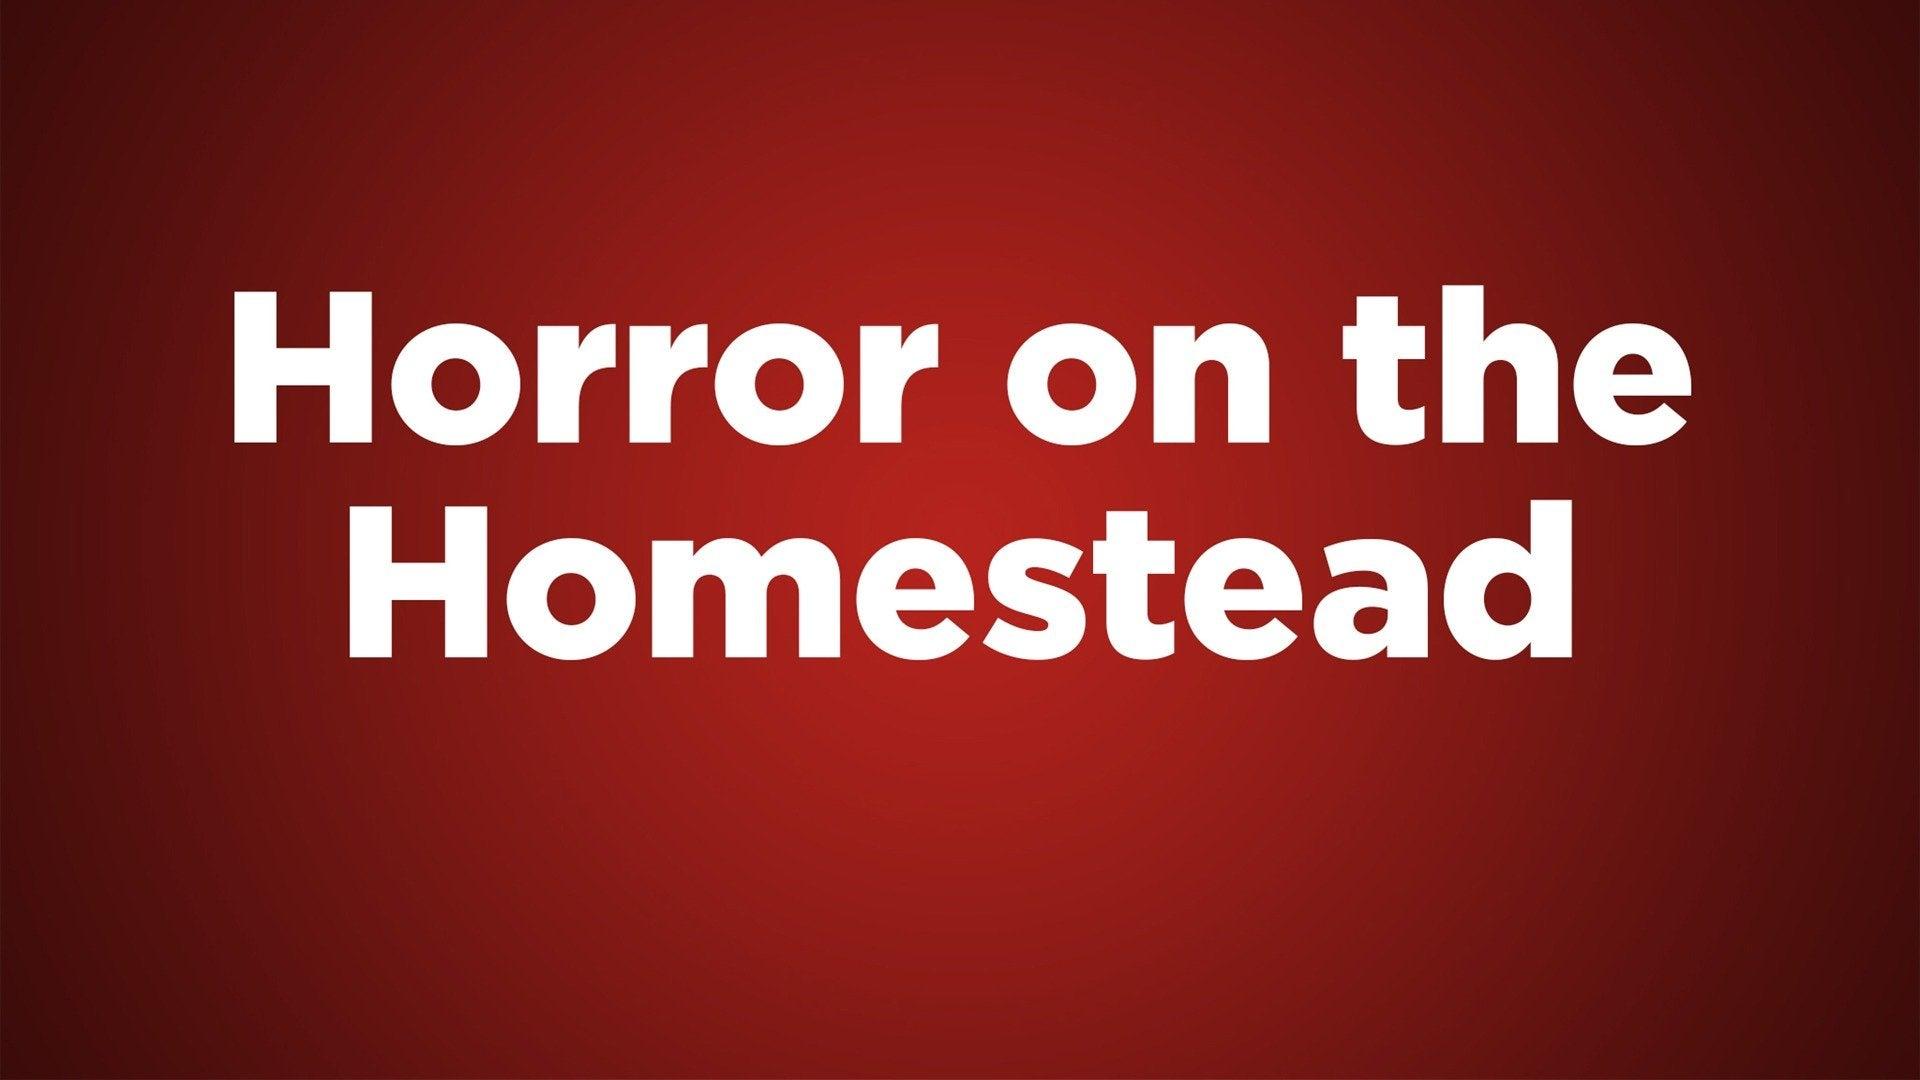 Horror on the Homestead